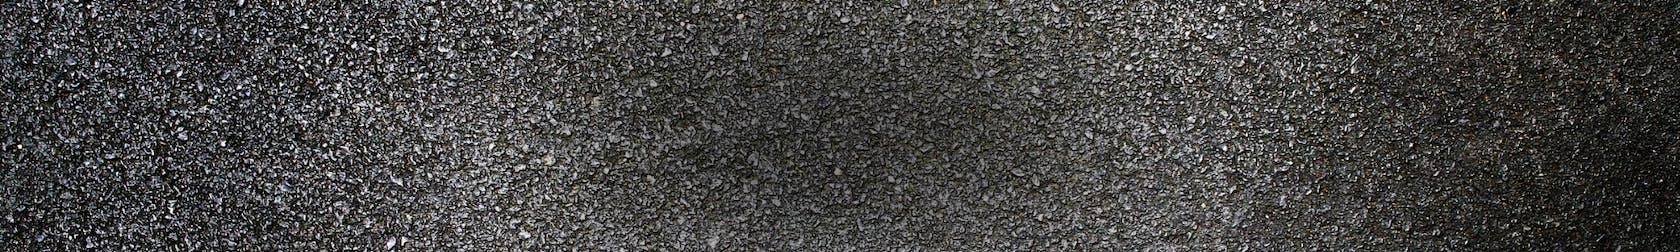 Dark Image Placeholder